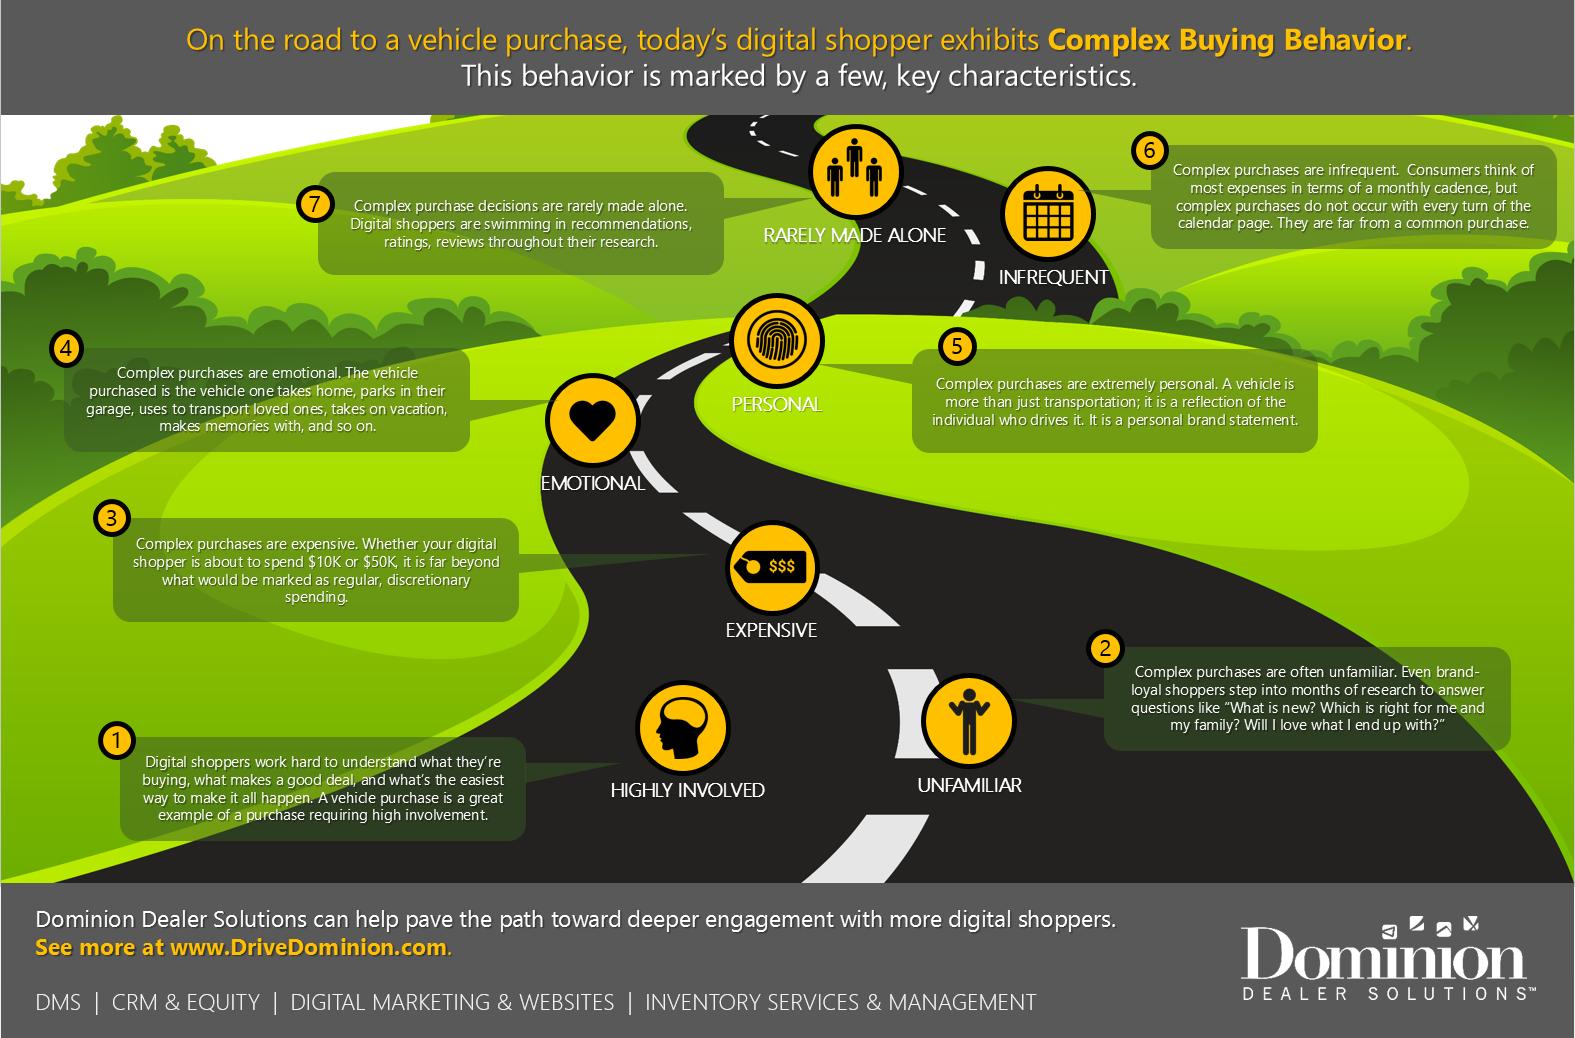 understanding complex buying behavior dominion dealer solutions. Black Bedroom Furniture Sets. Home Design Ideas